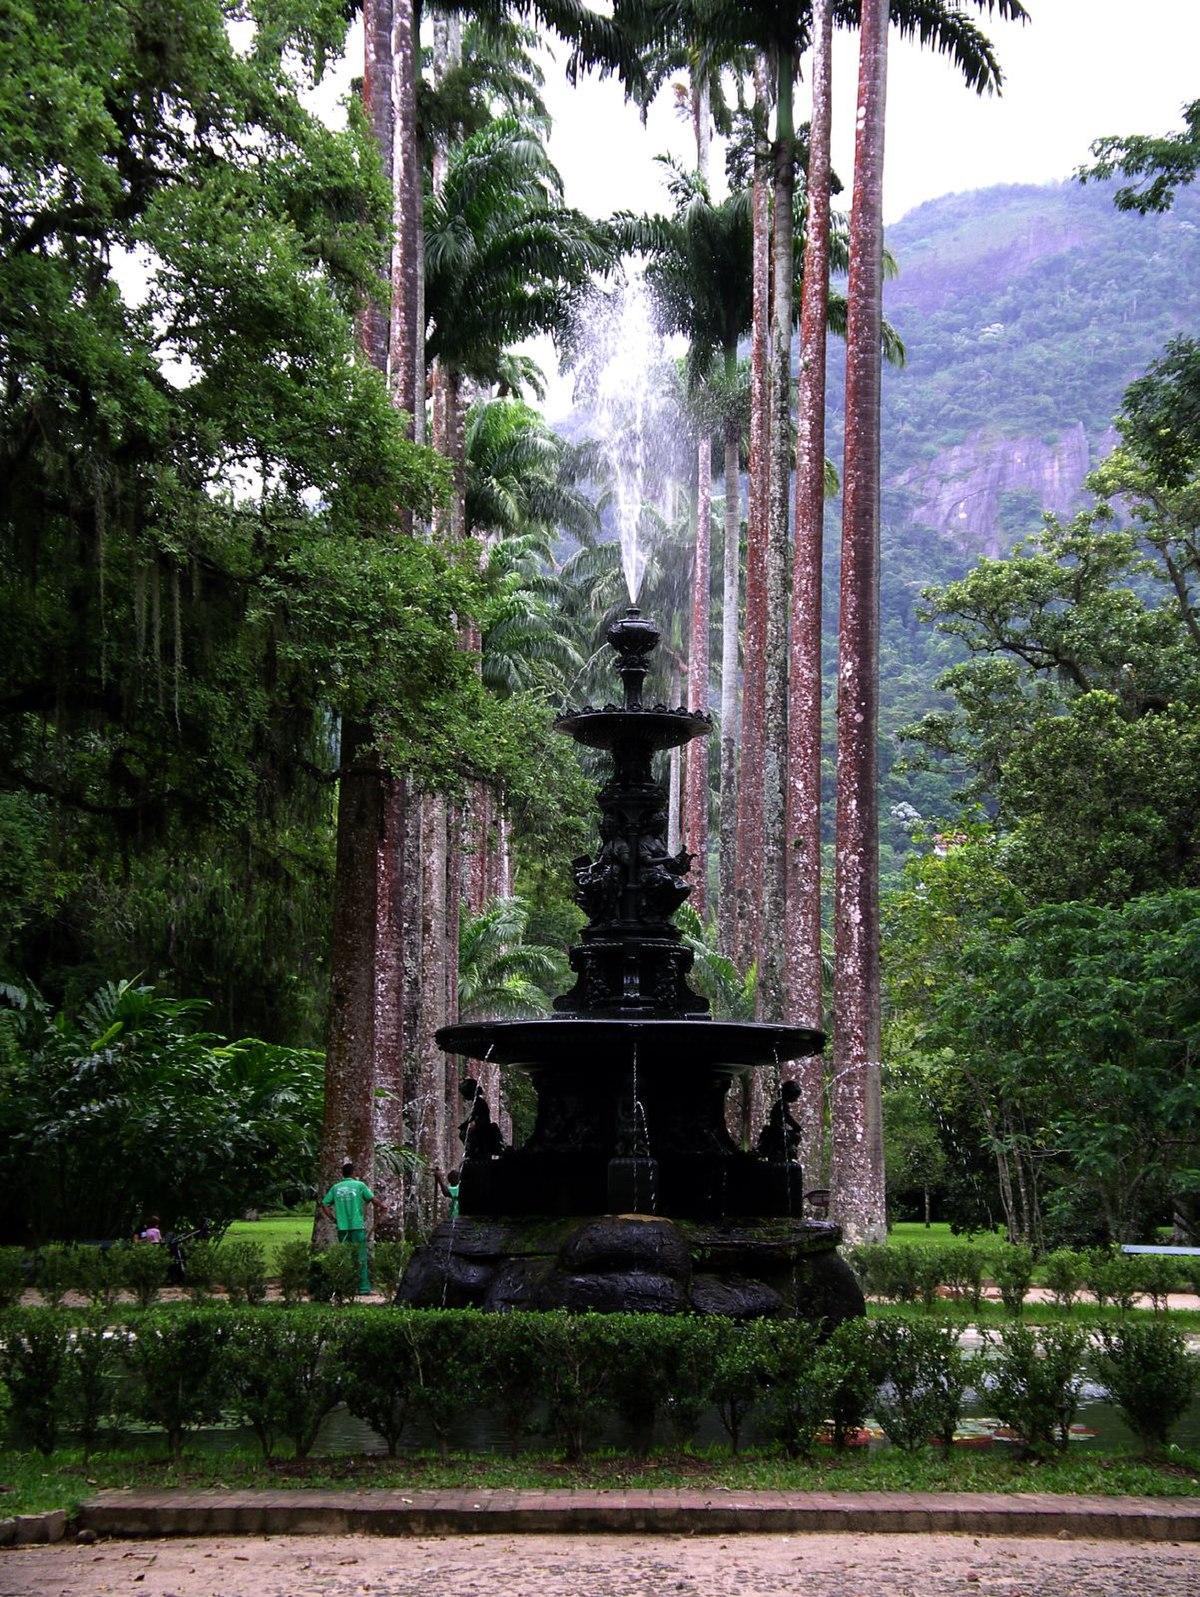 Jardin botanique de rio de janeiro wikip dia for Rabais jardin botanique 2016